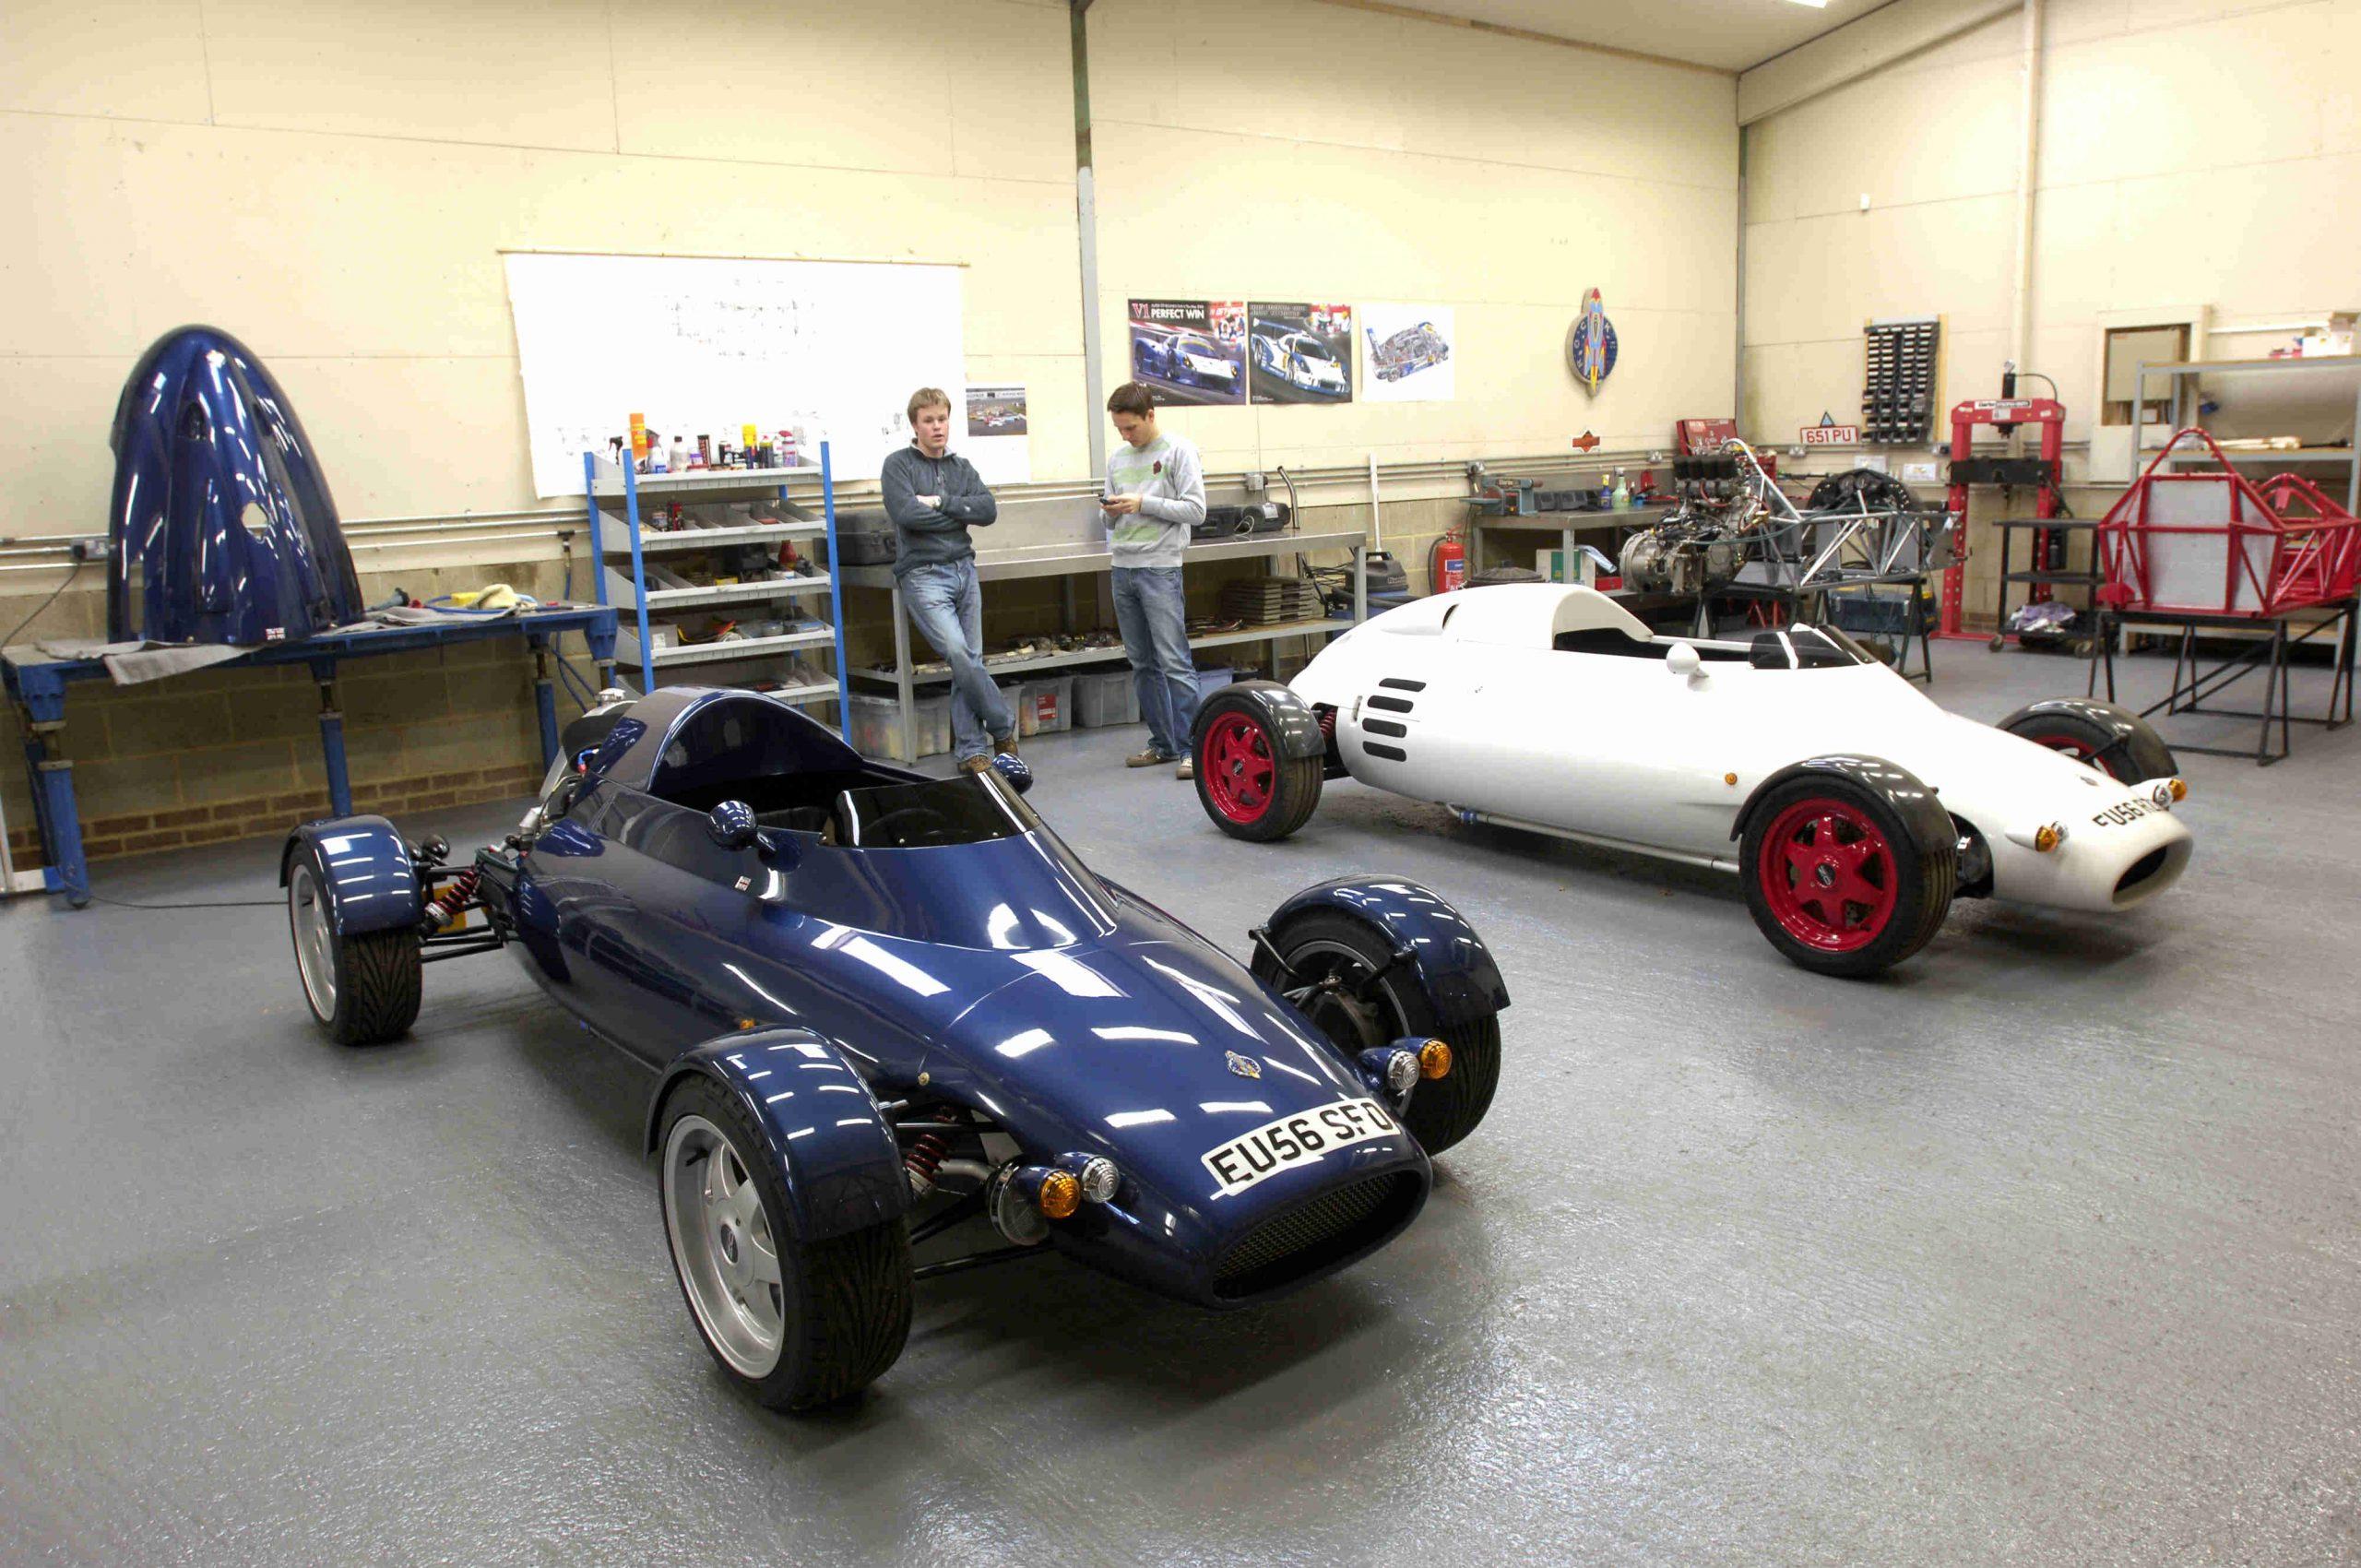 Rocket car parked in garage